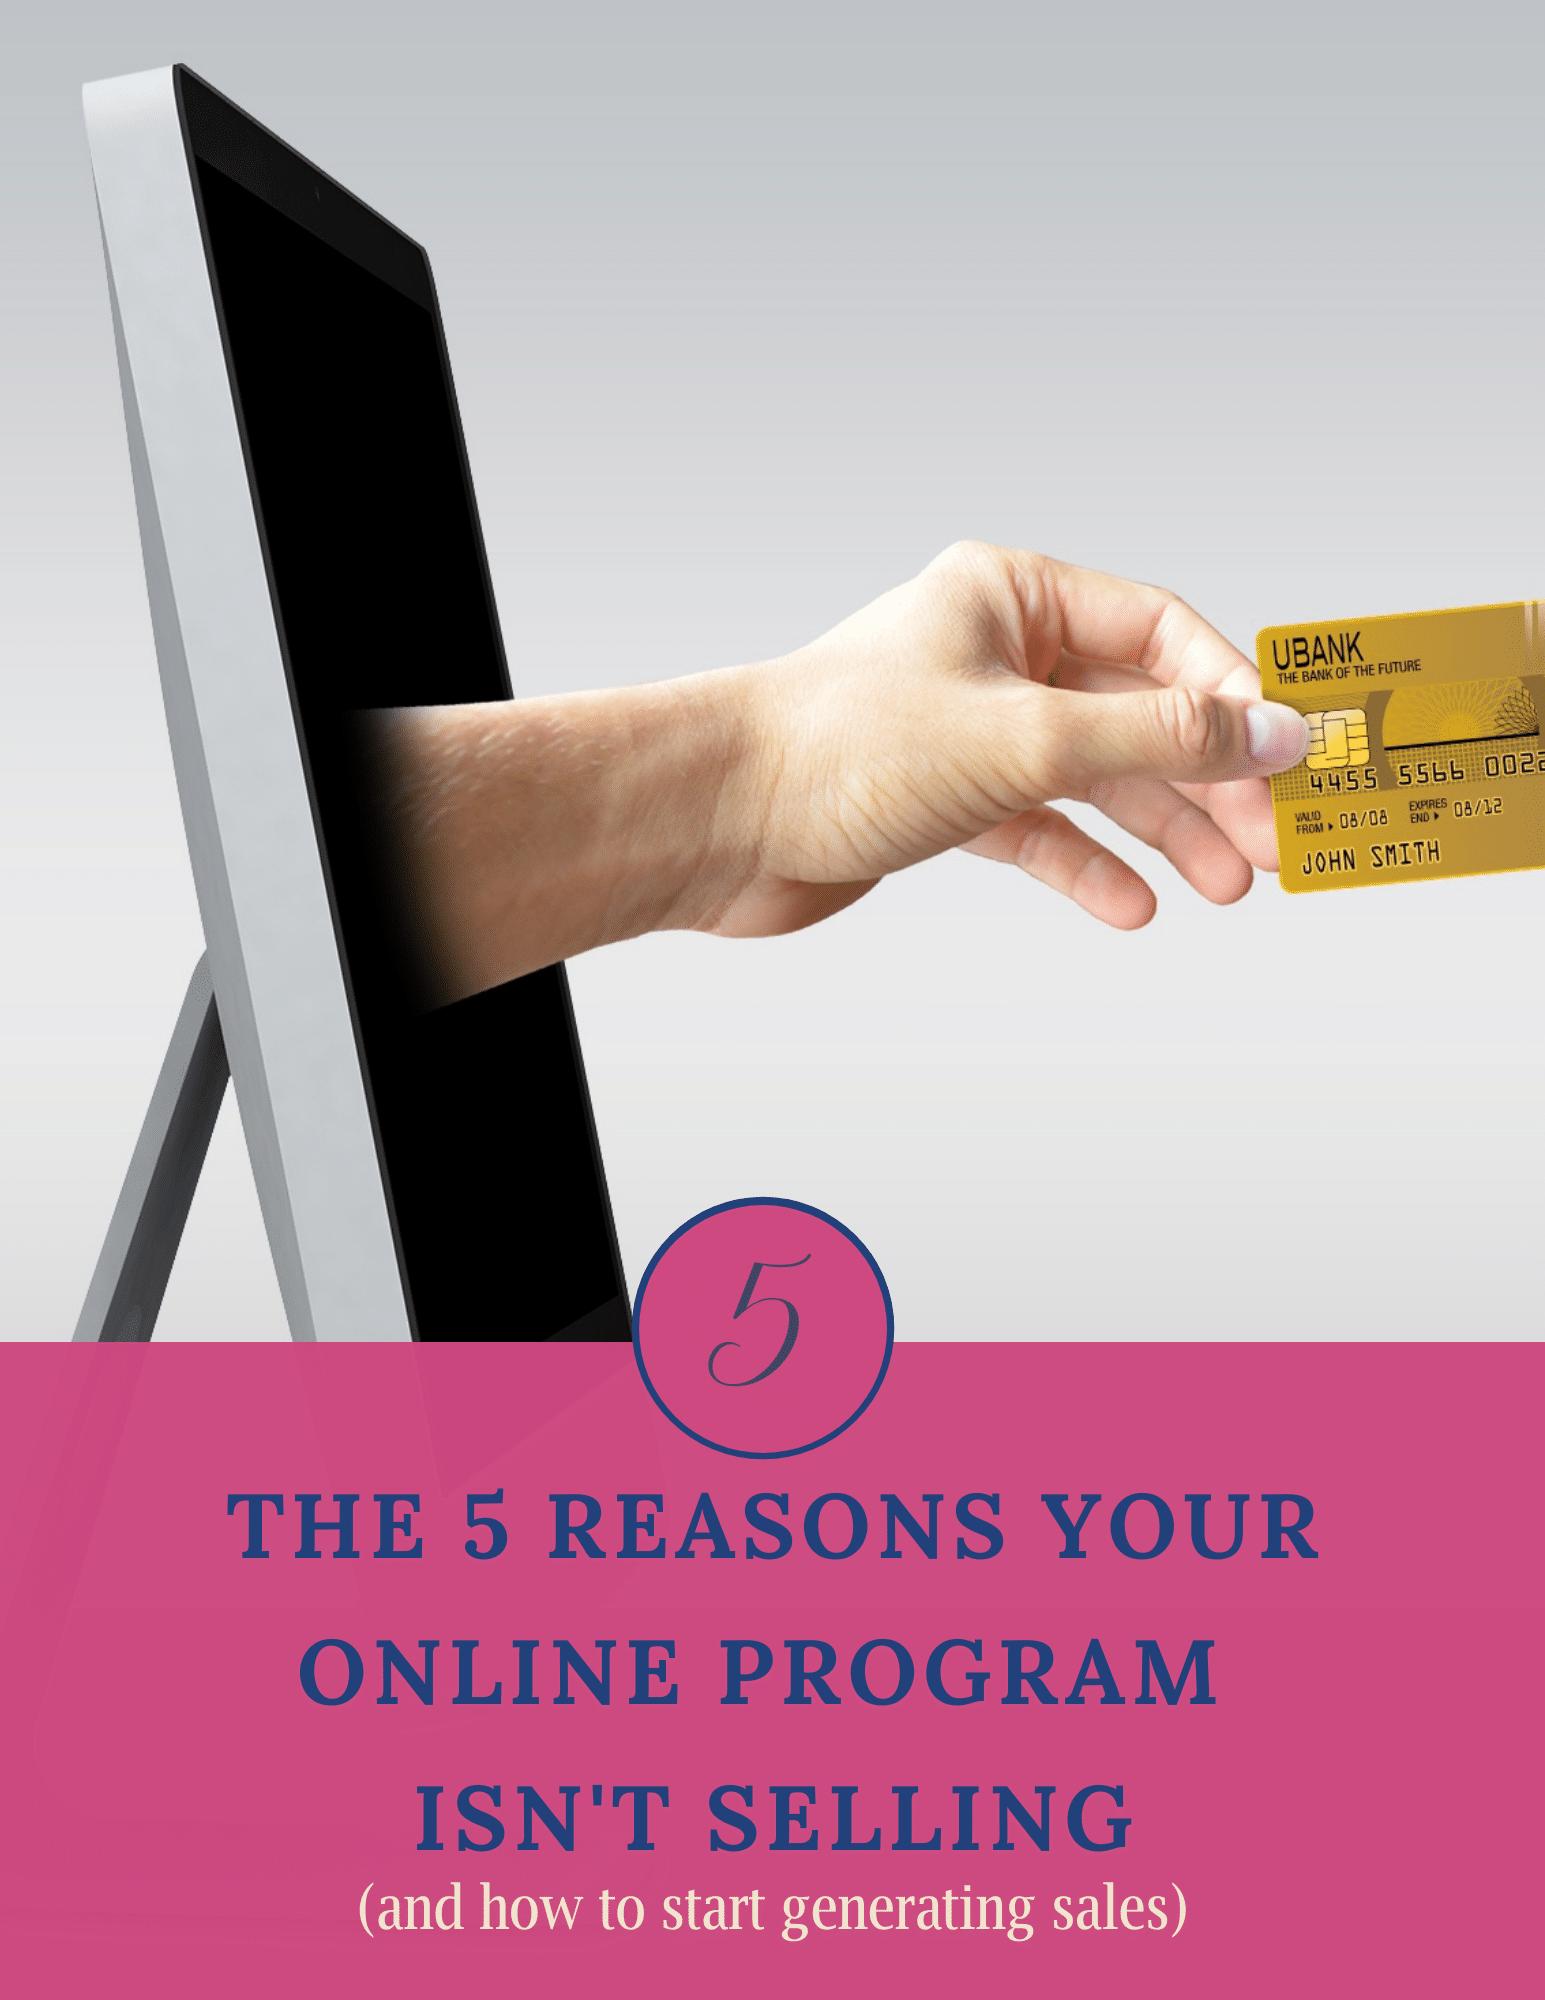 5 Reasons Your Online Program Isn't Selling